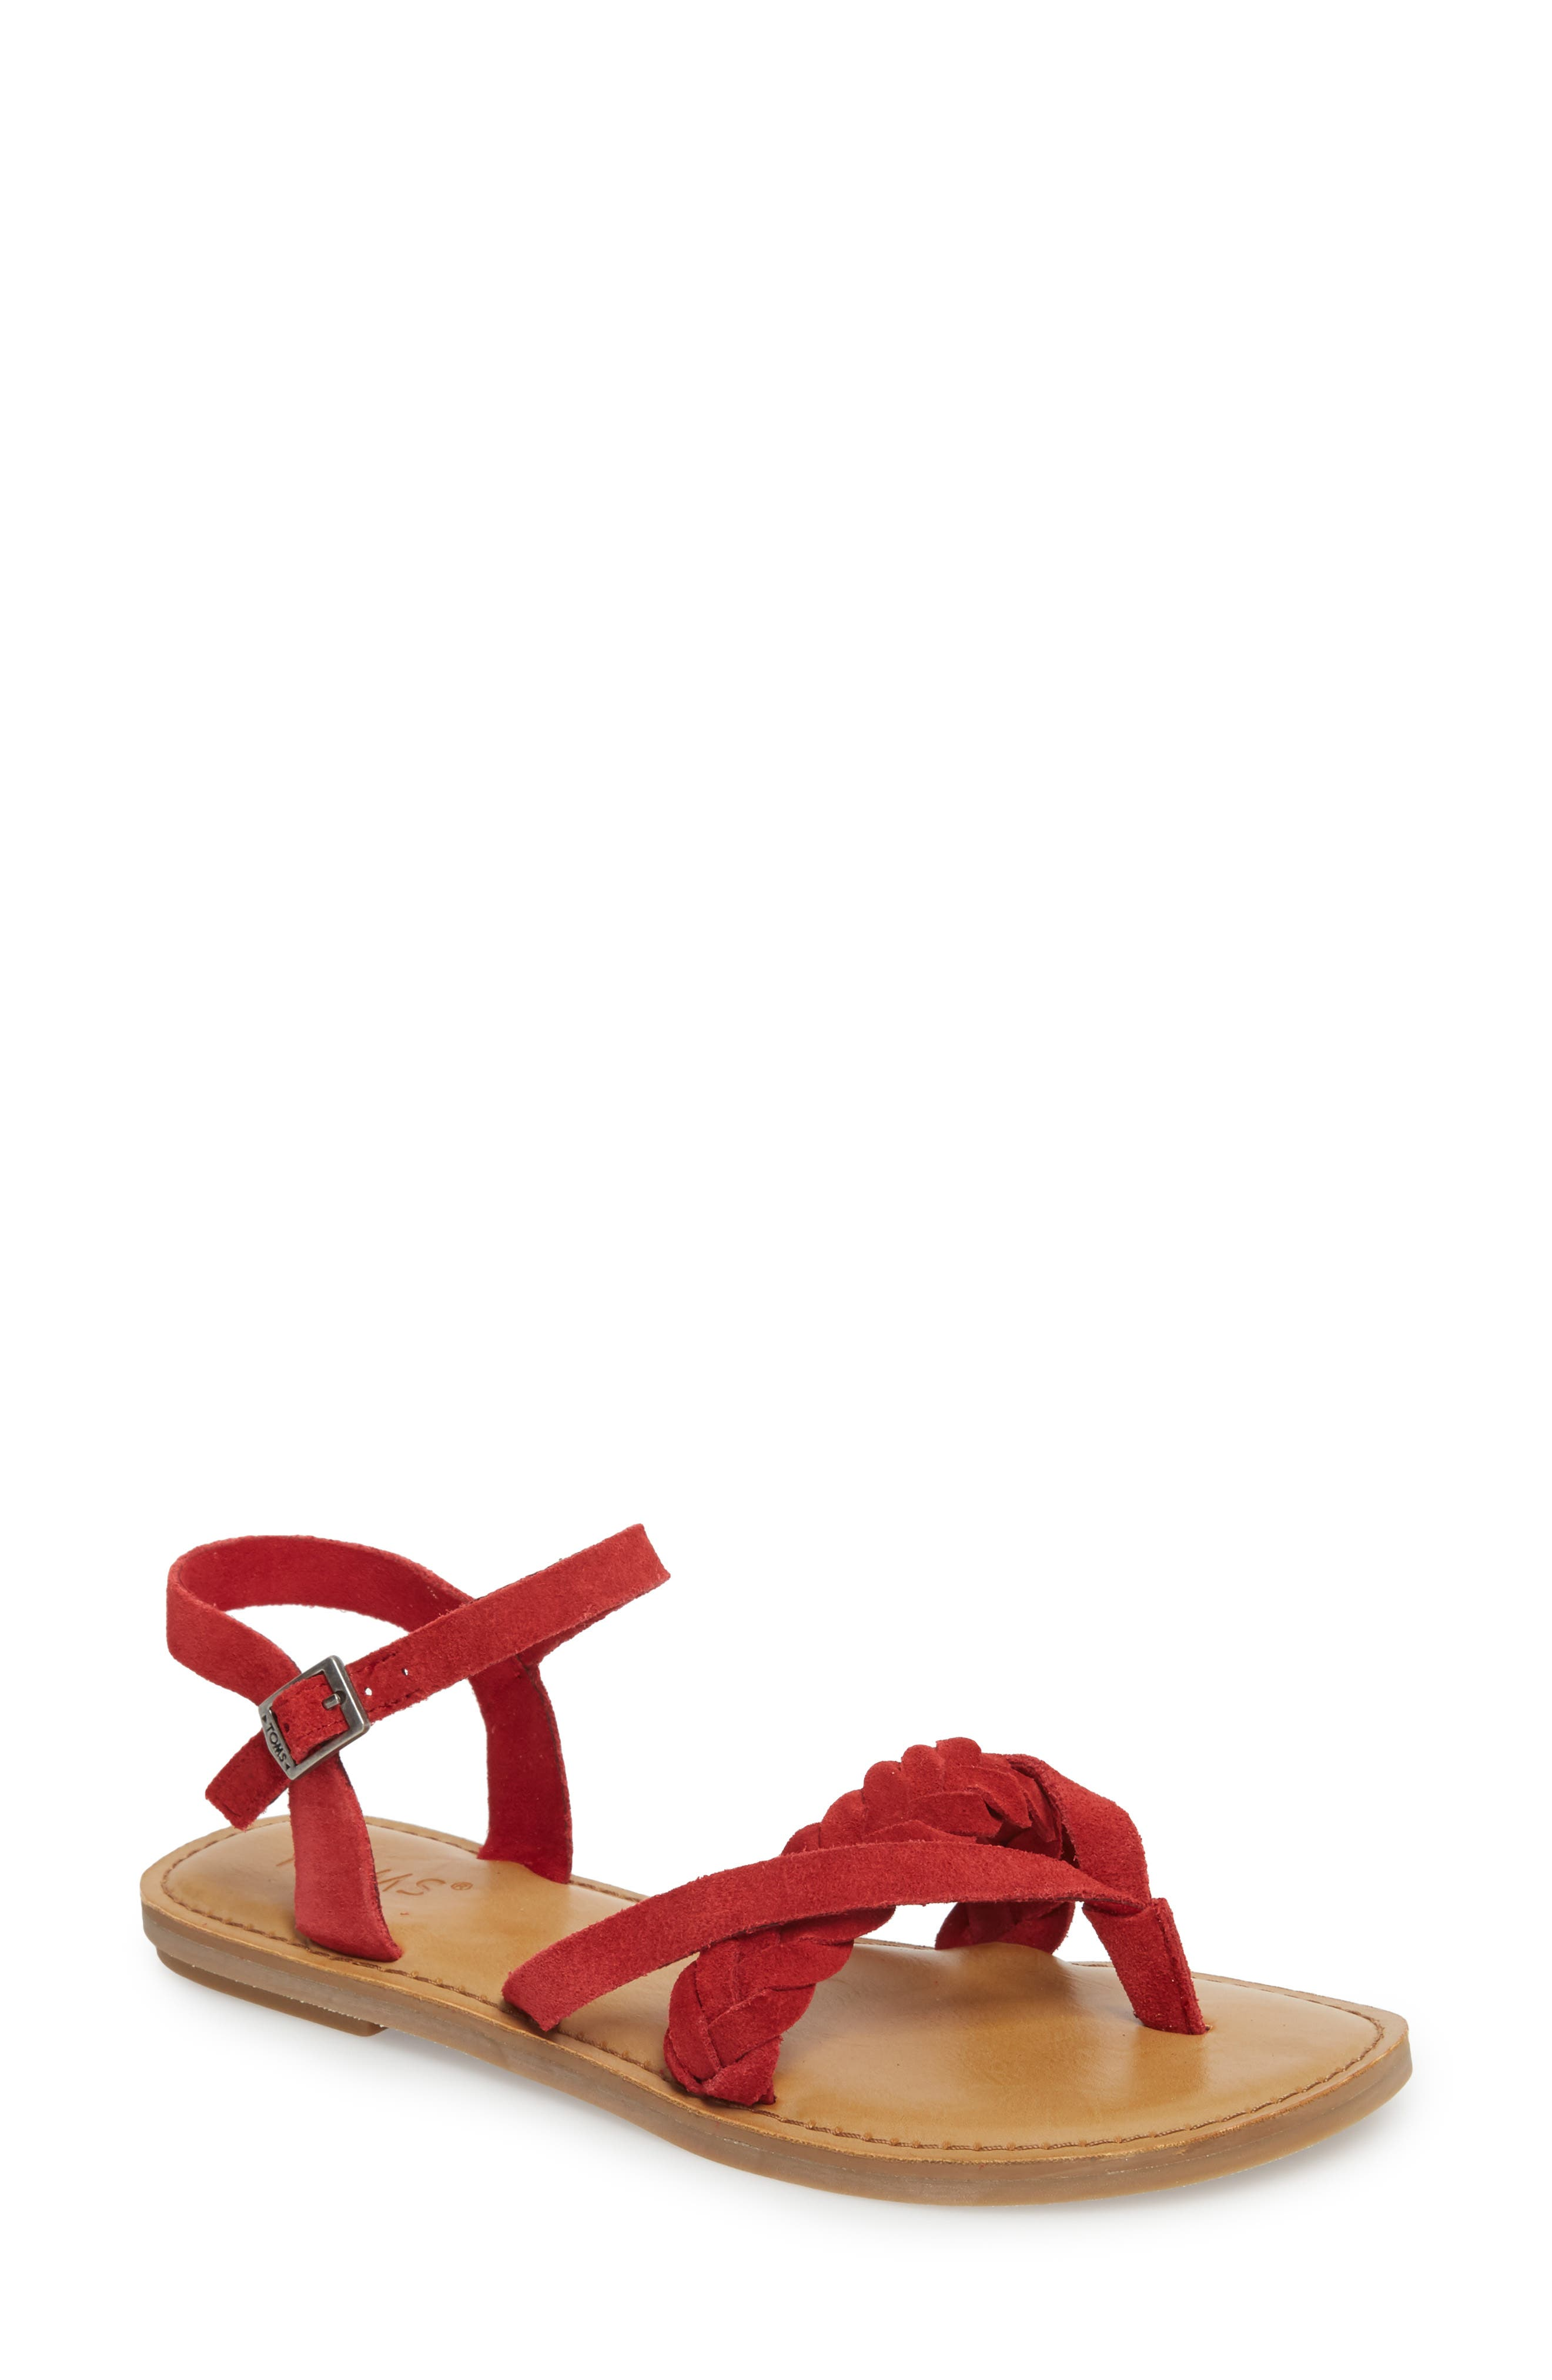 'Lexie' Sandal,                         Main,                         color,